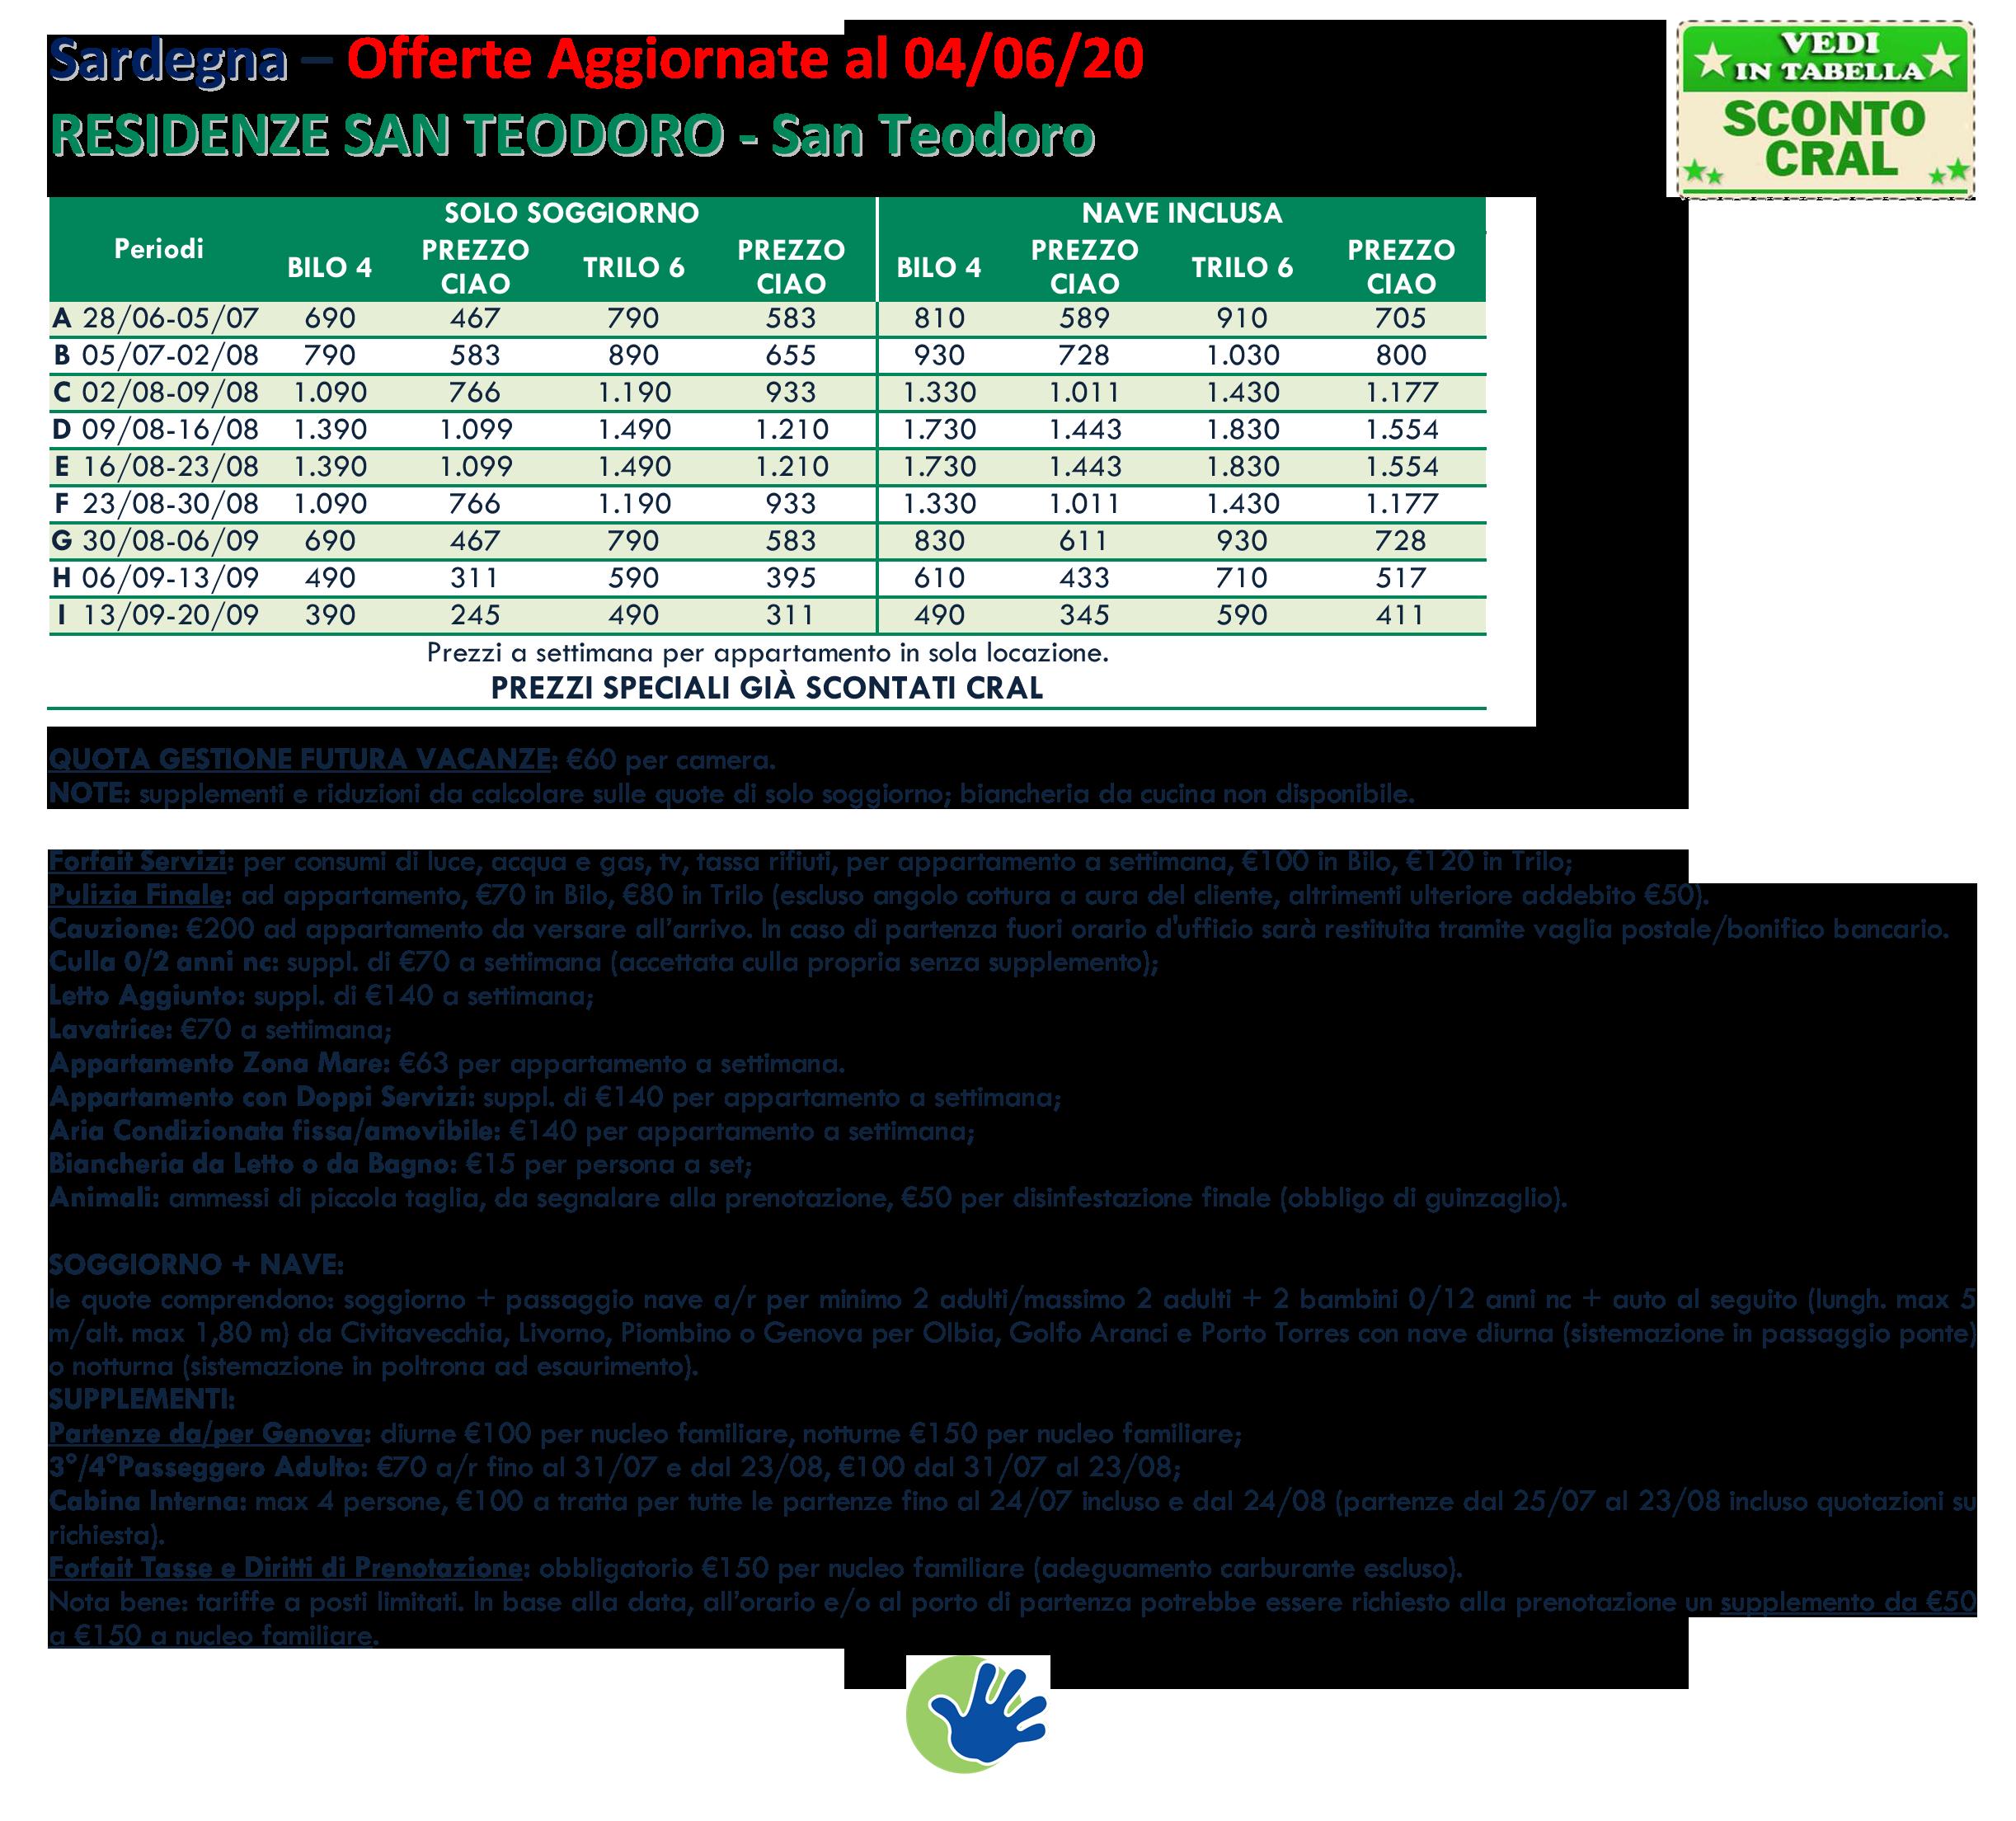 offerte 2020 Residenze San Teodoro 2020